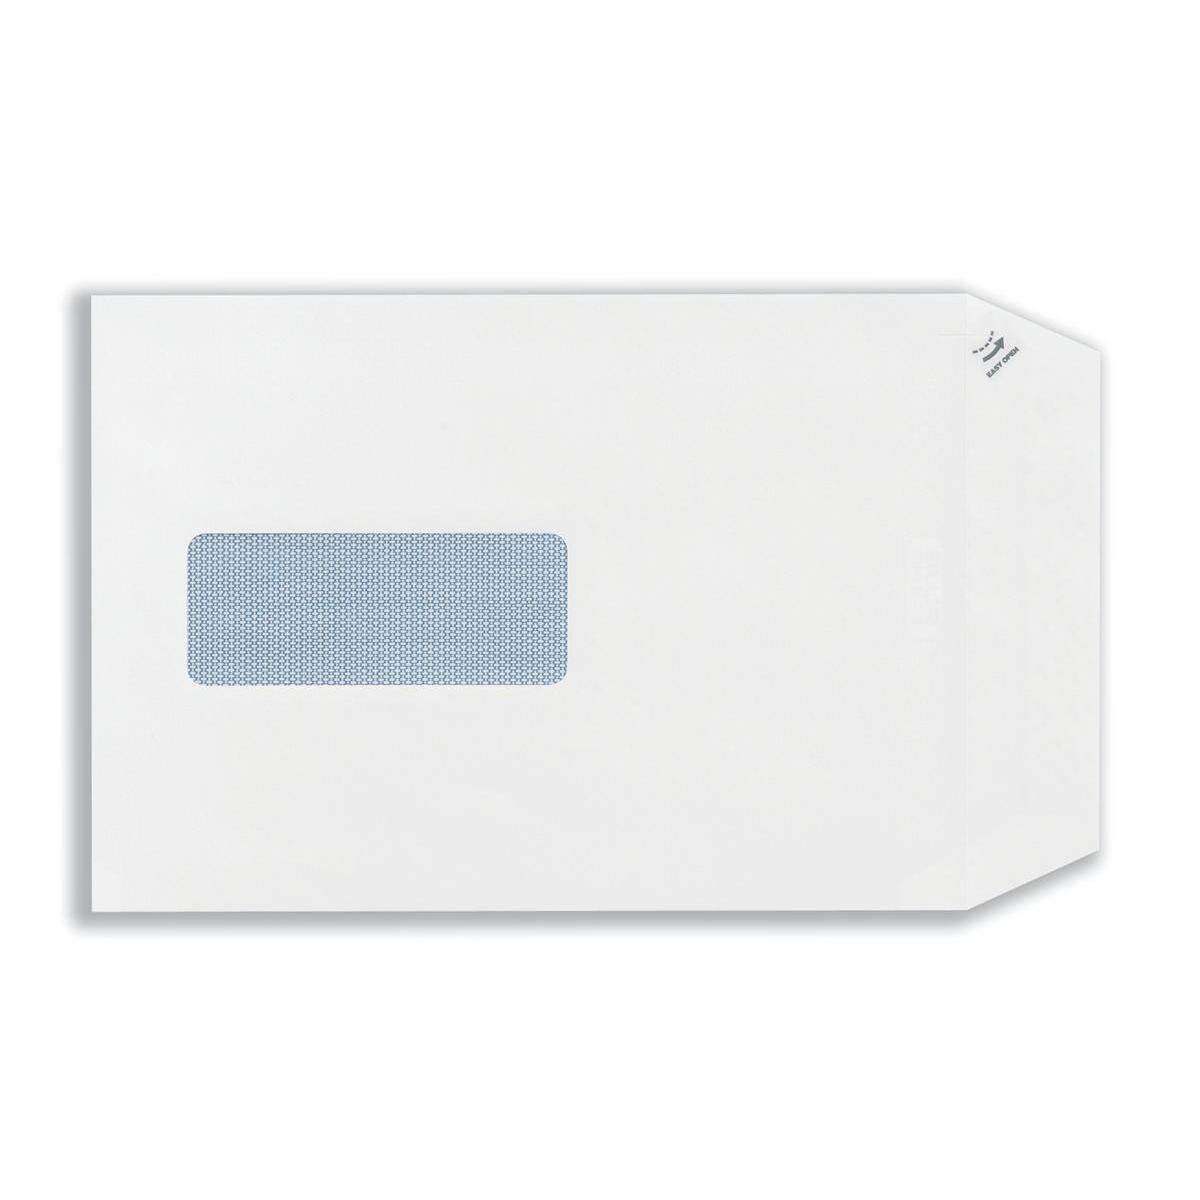 Plus Fabric Envelopes PEFC Pocket Self Seal Window 120gsm C5 229x162mm White Ref C26870 Pack 500